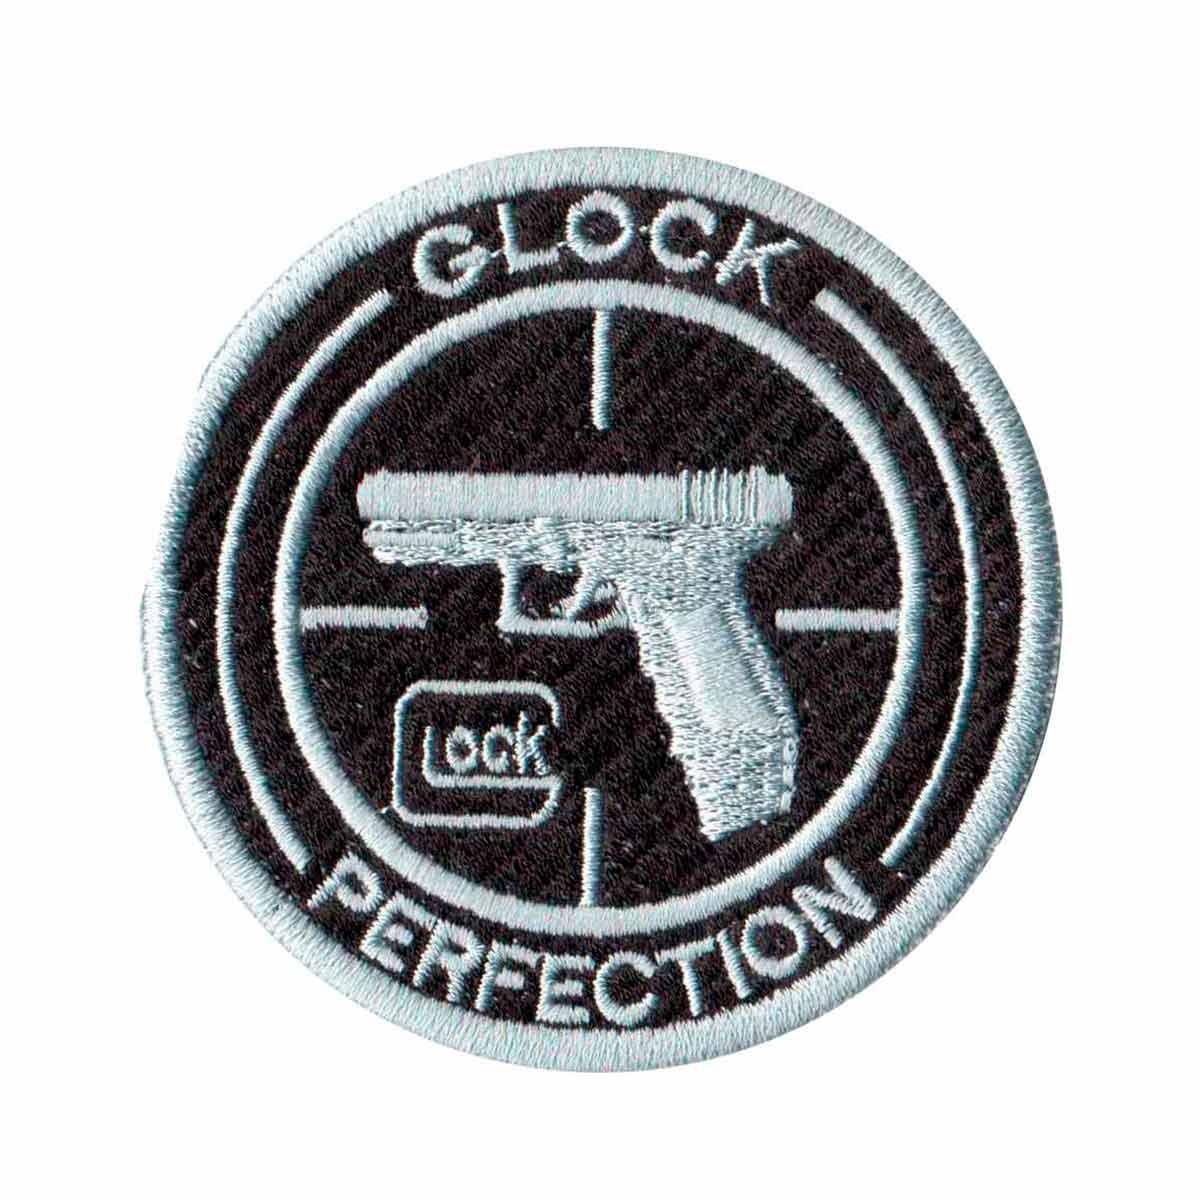 Patch Bordado - Logo Simbolo Marca Glock DV80073-336  - Talysmã Bordados